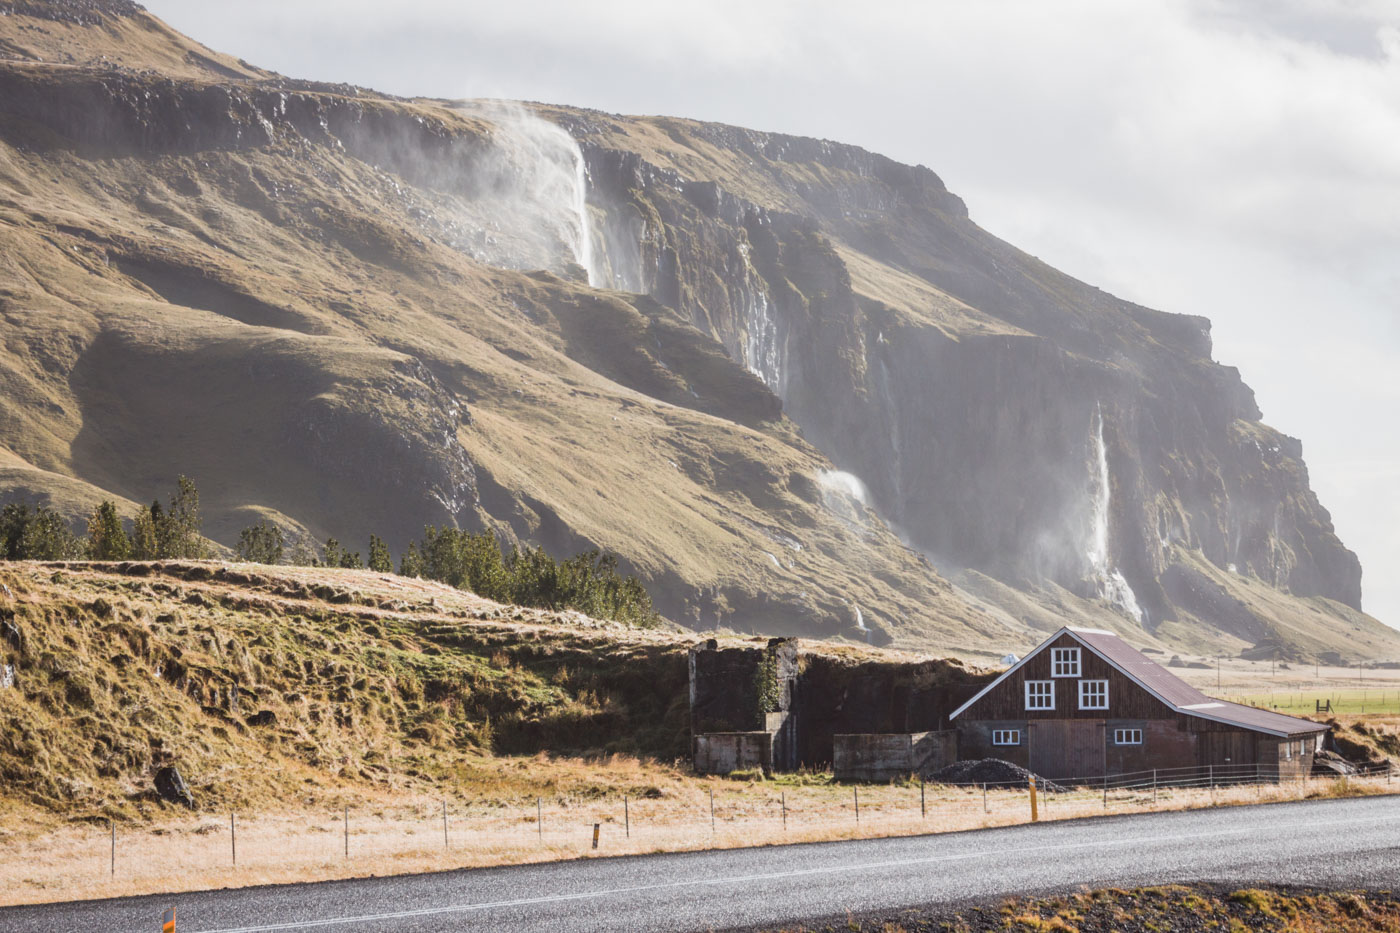 Islandia, droga obok wodospadu Seljalandsfoss